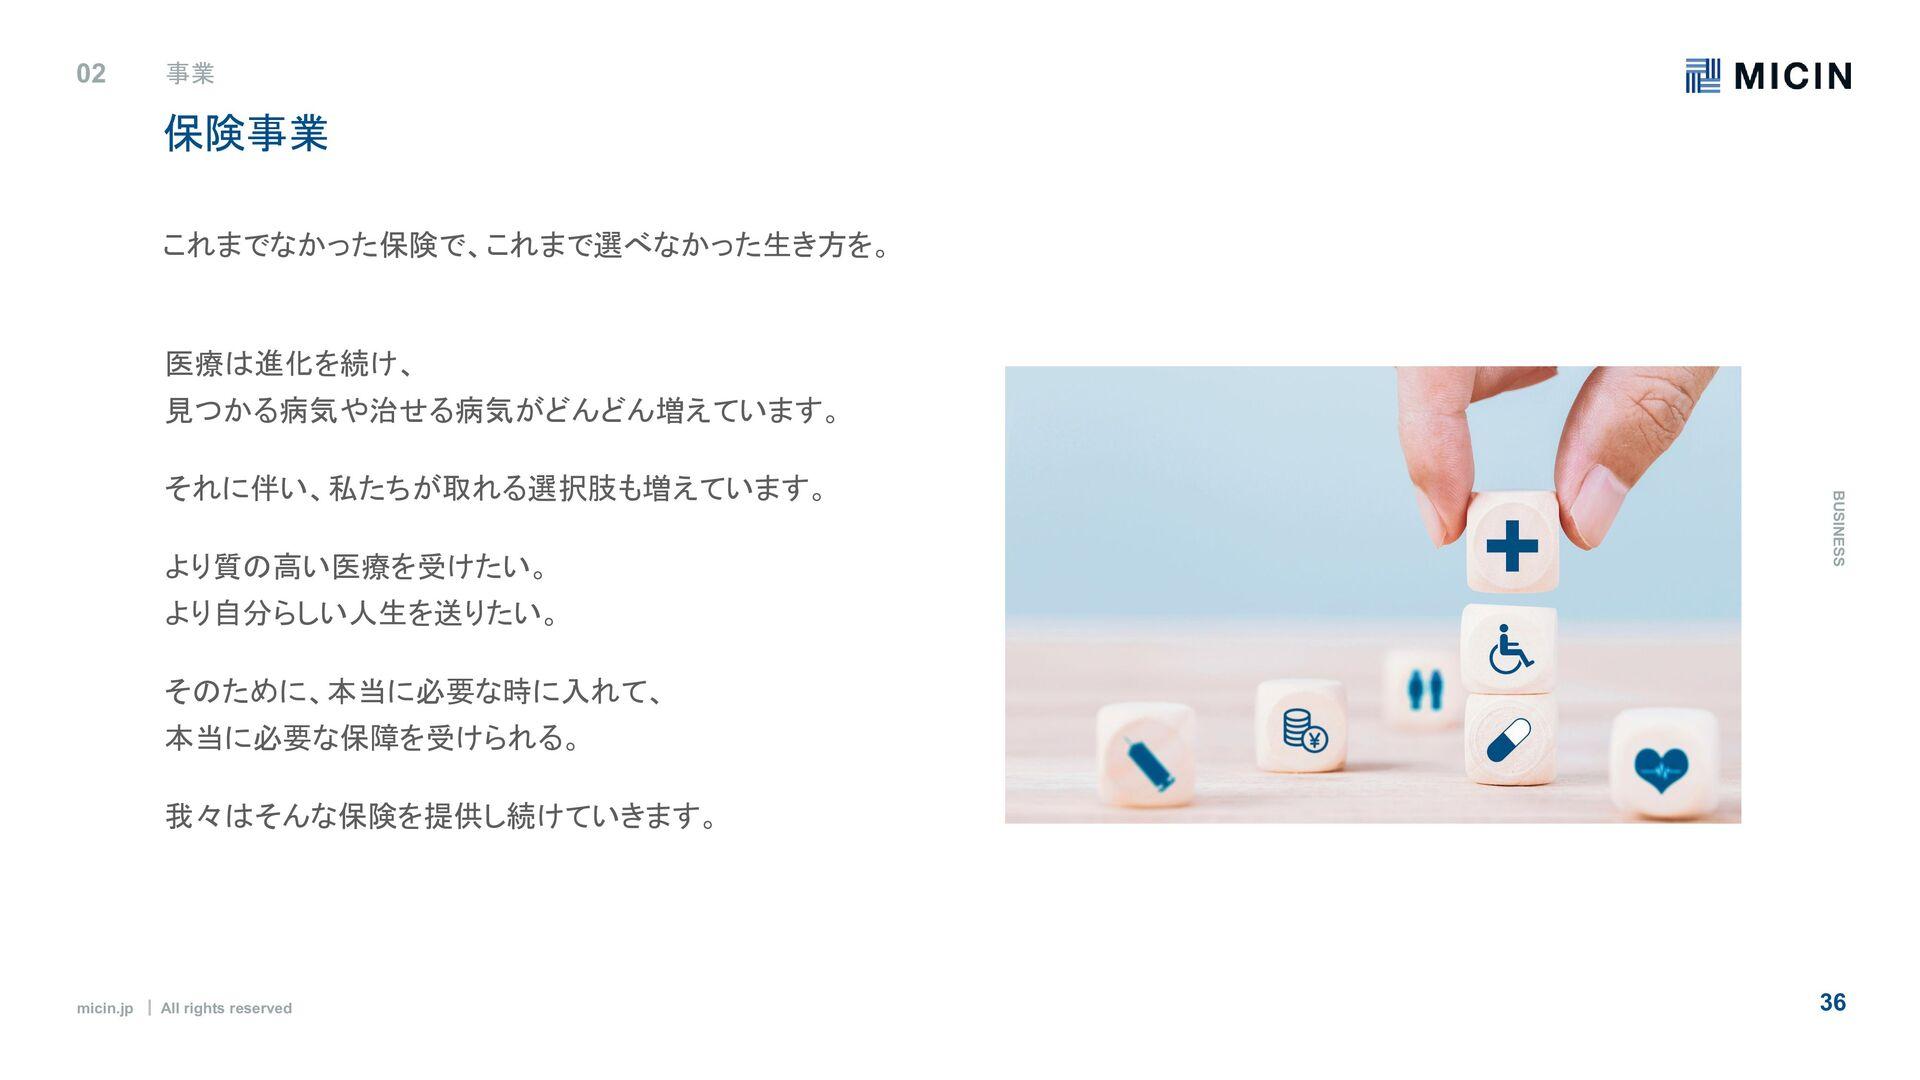 micin.jp   All rights reserved 36 05 DEVELOPMEN...